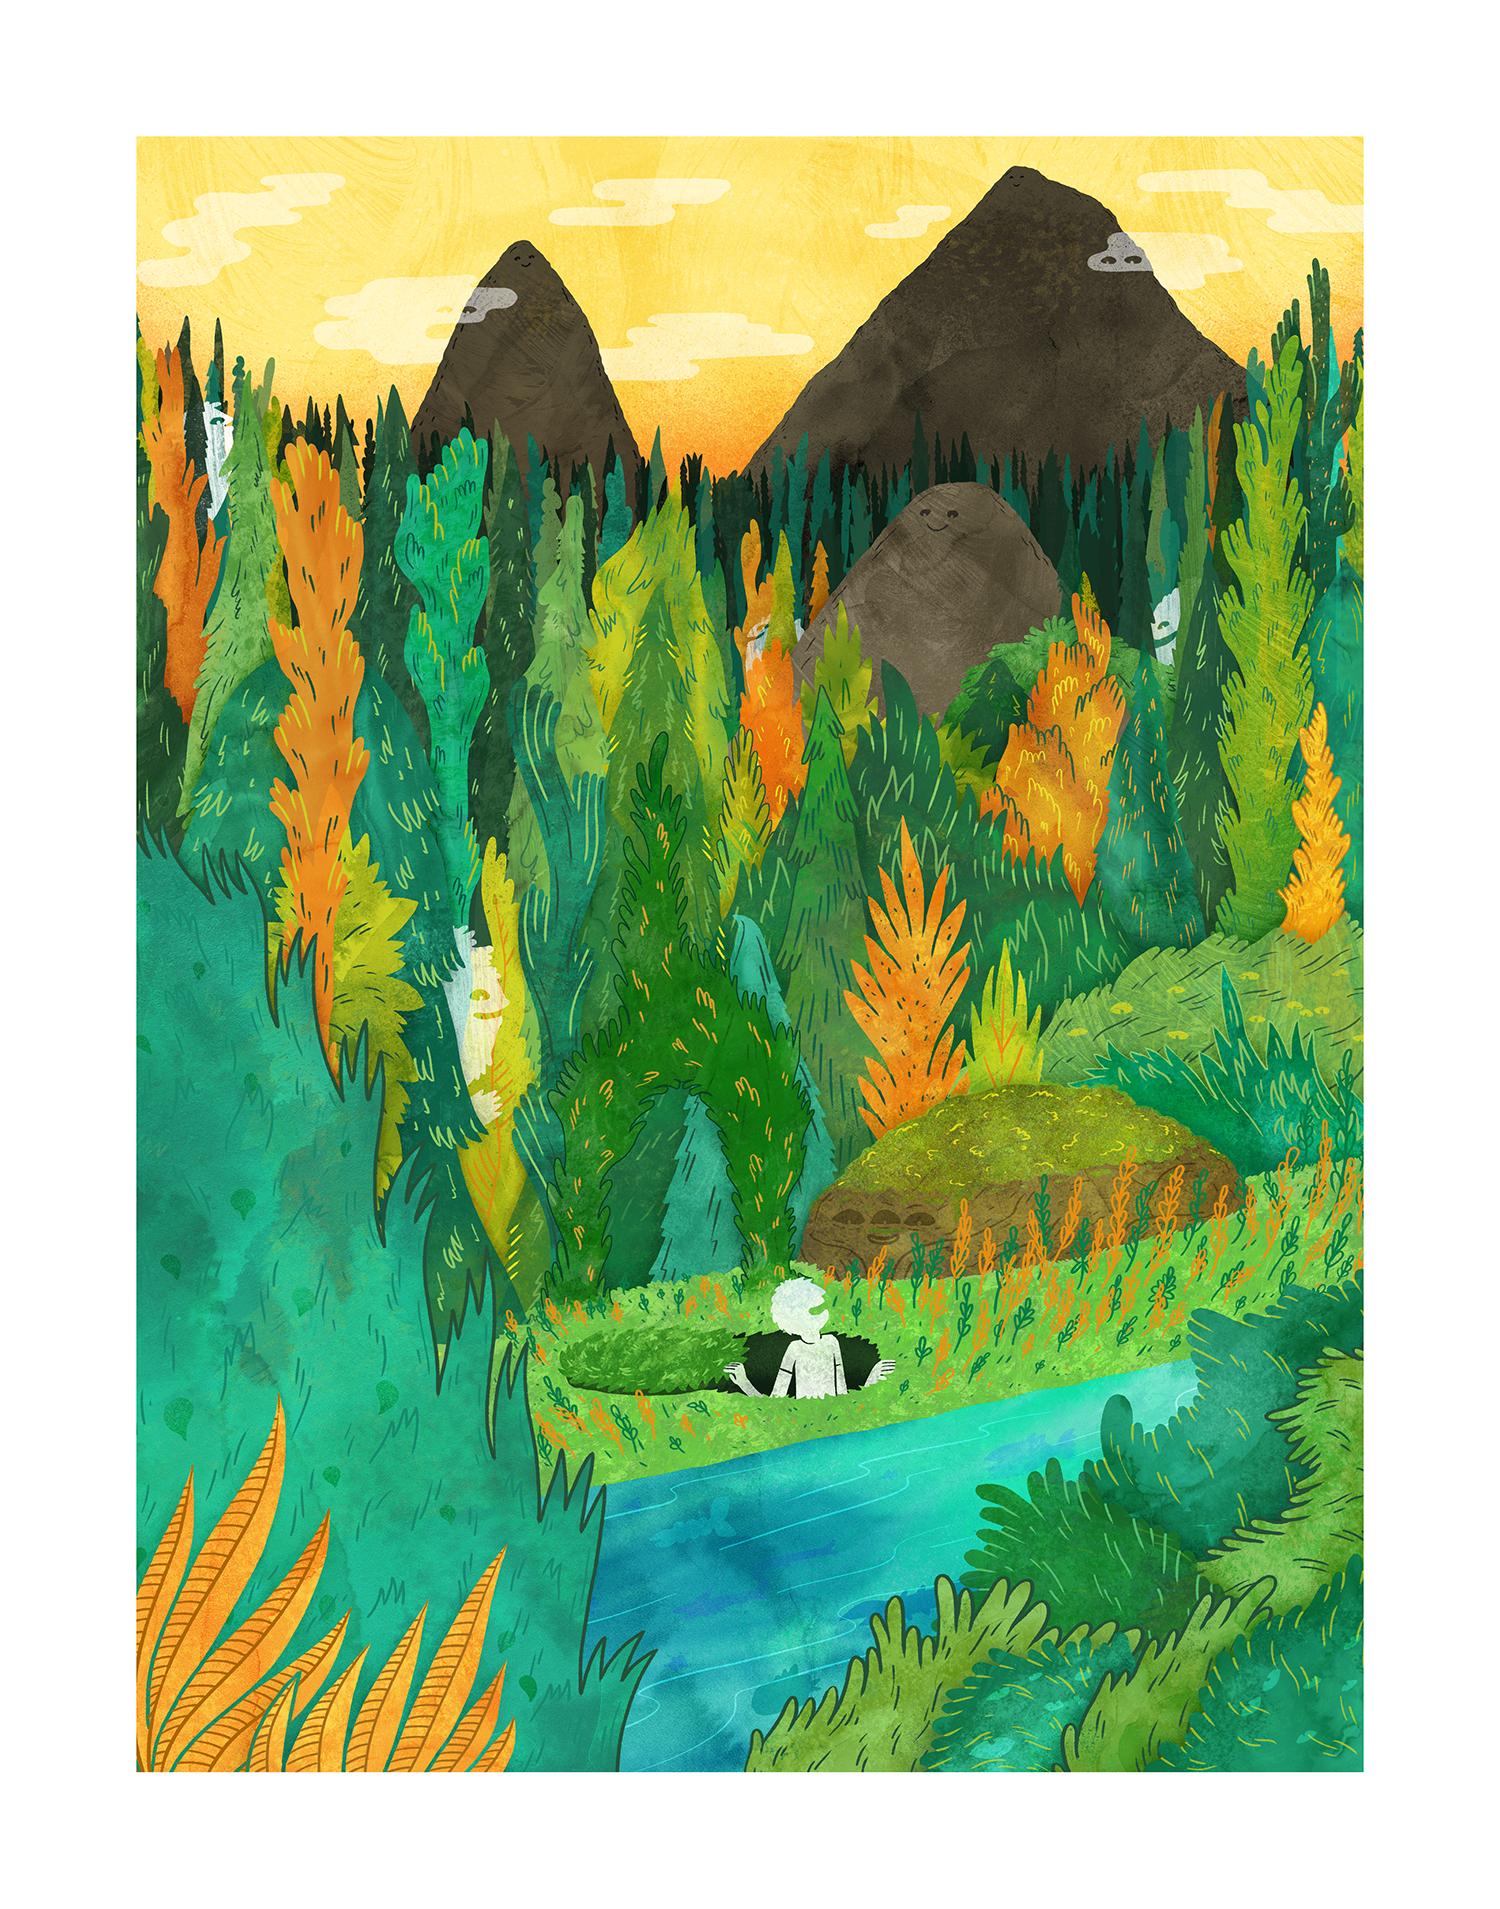 'Wild' by Jolby & Friends